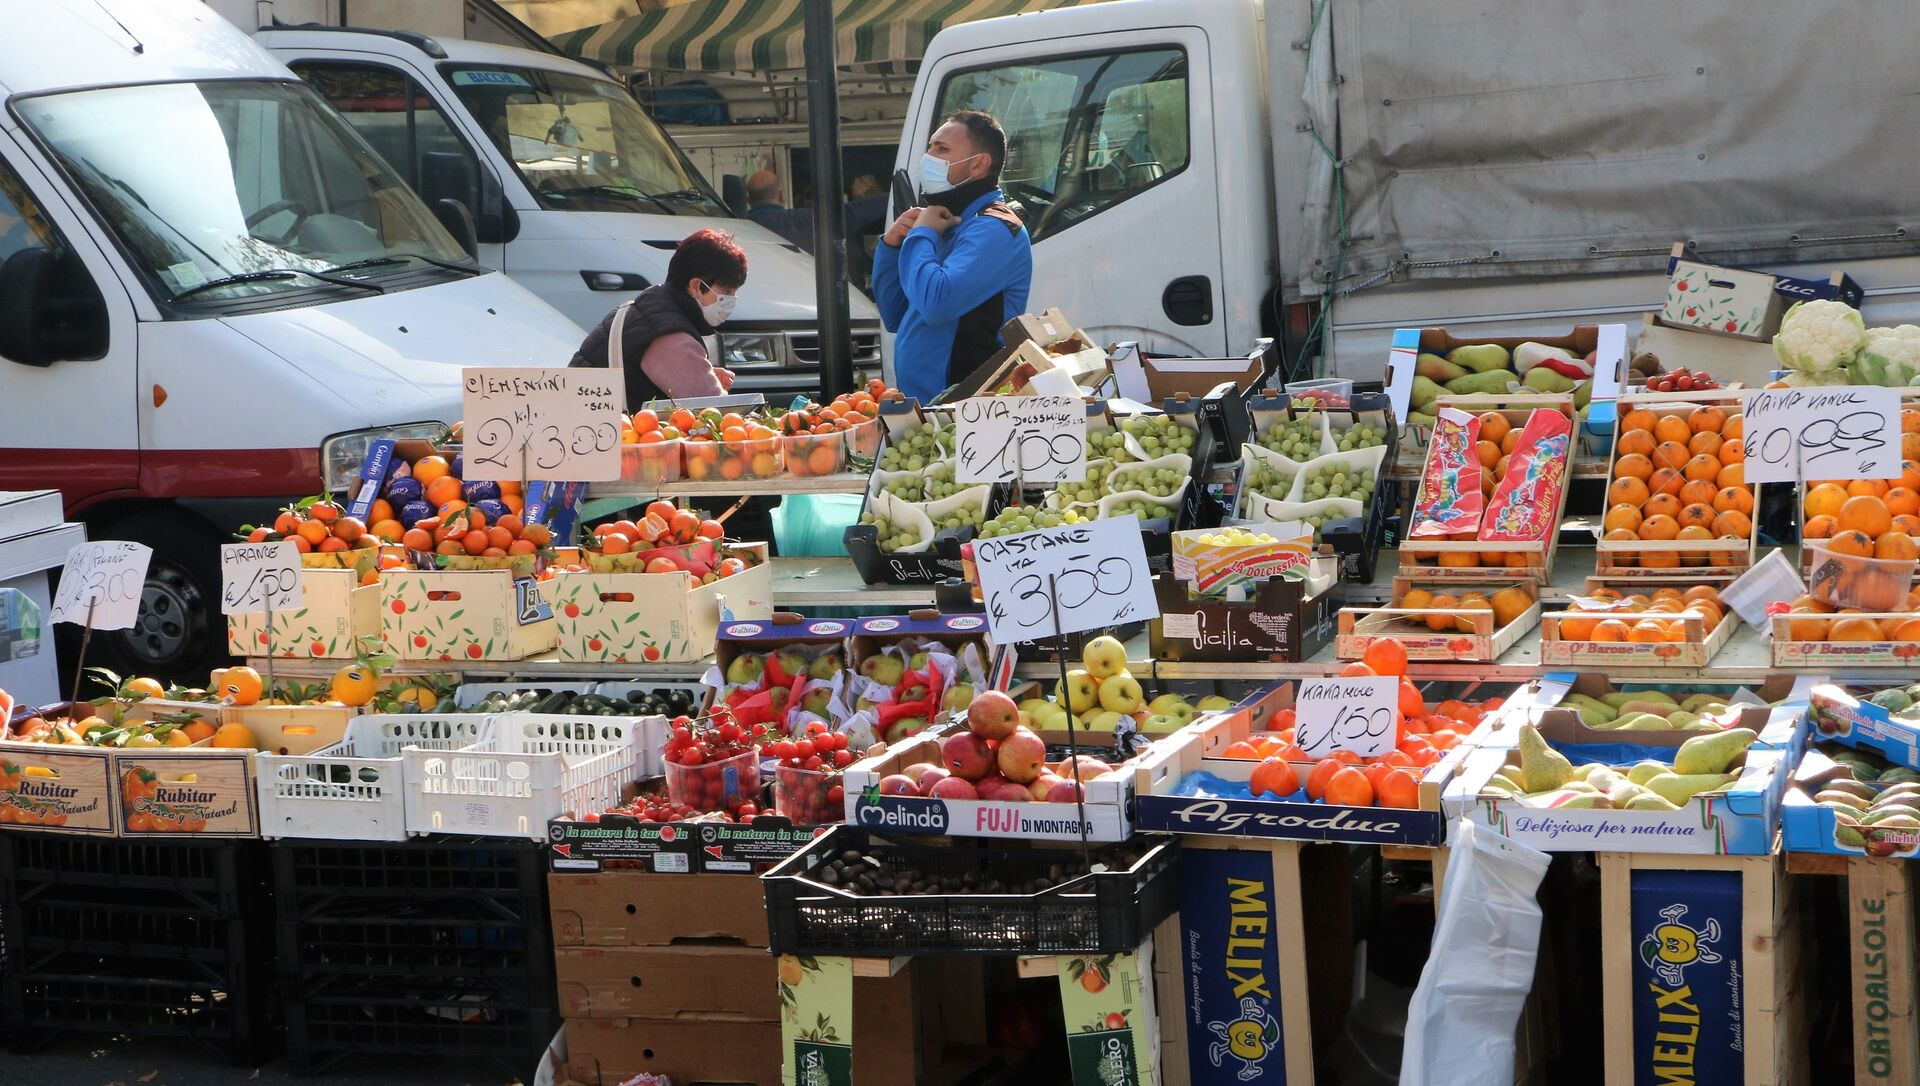 Mercato di frutta e verdura - Sputnik Italia, 1920, 20.02.2021